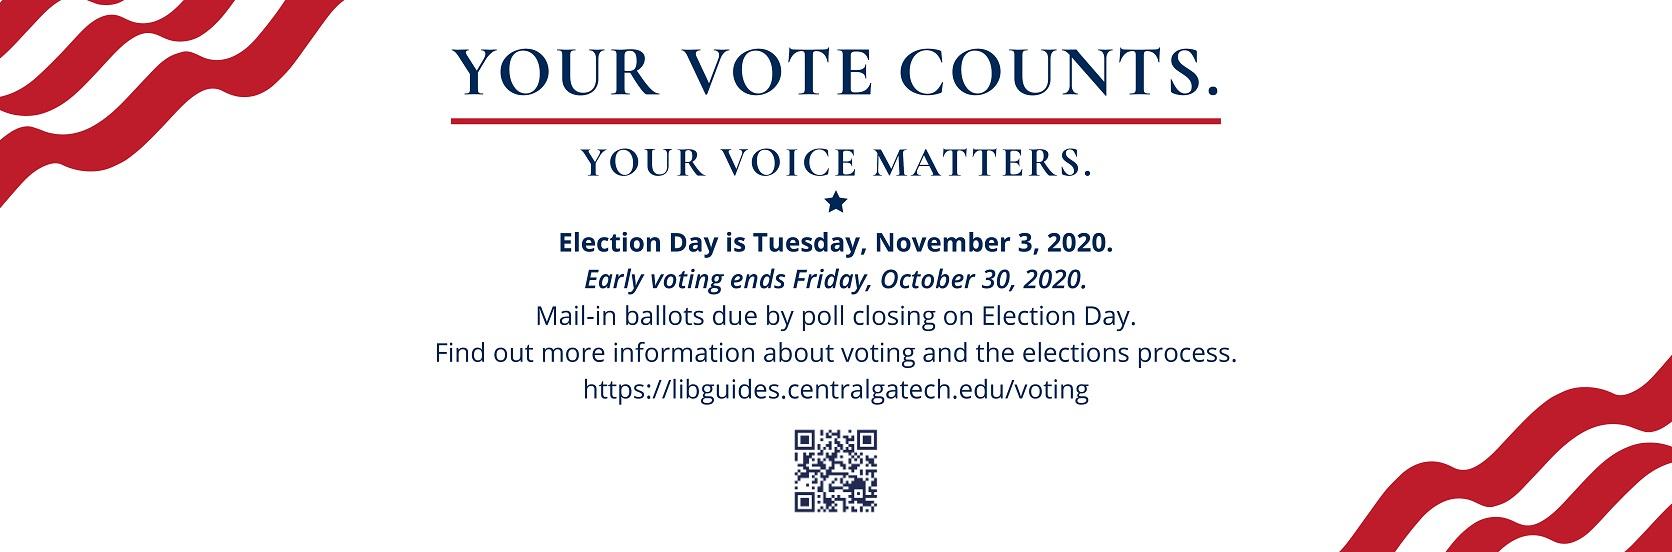 VOTE November 3.